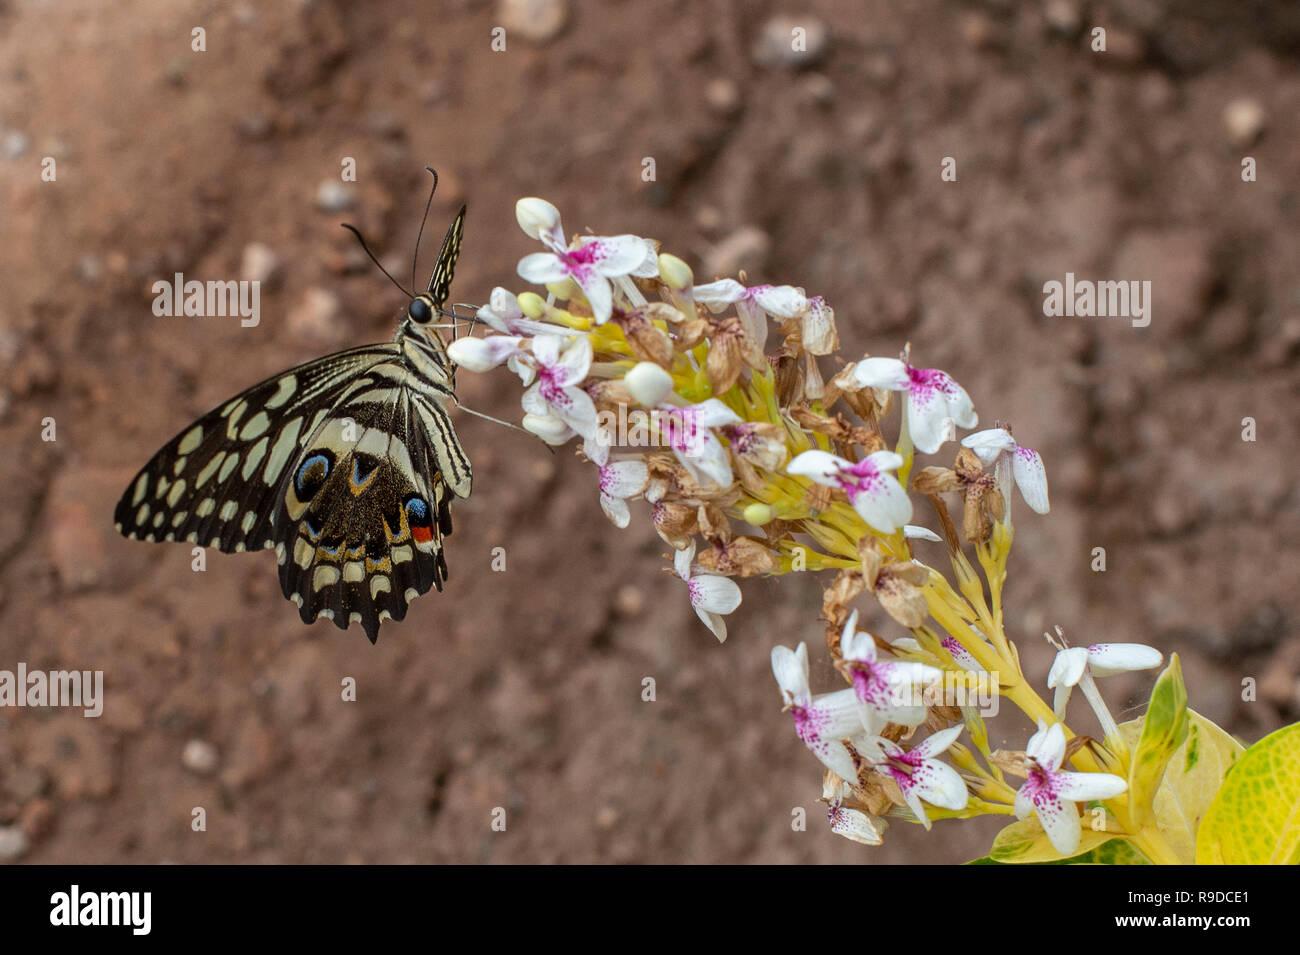 Citrus butterfly, Papilio demodocus, Papilionidae, Burkina Faso, Africa - Stock Image